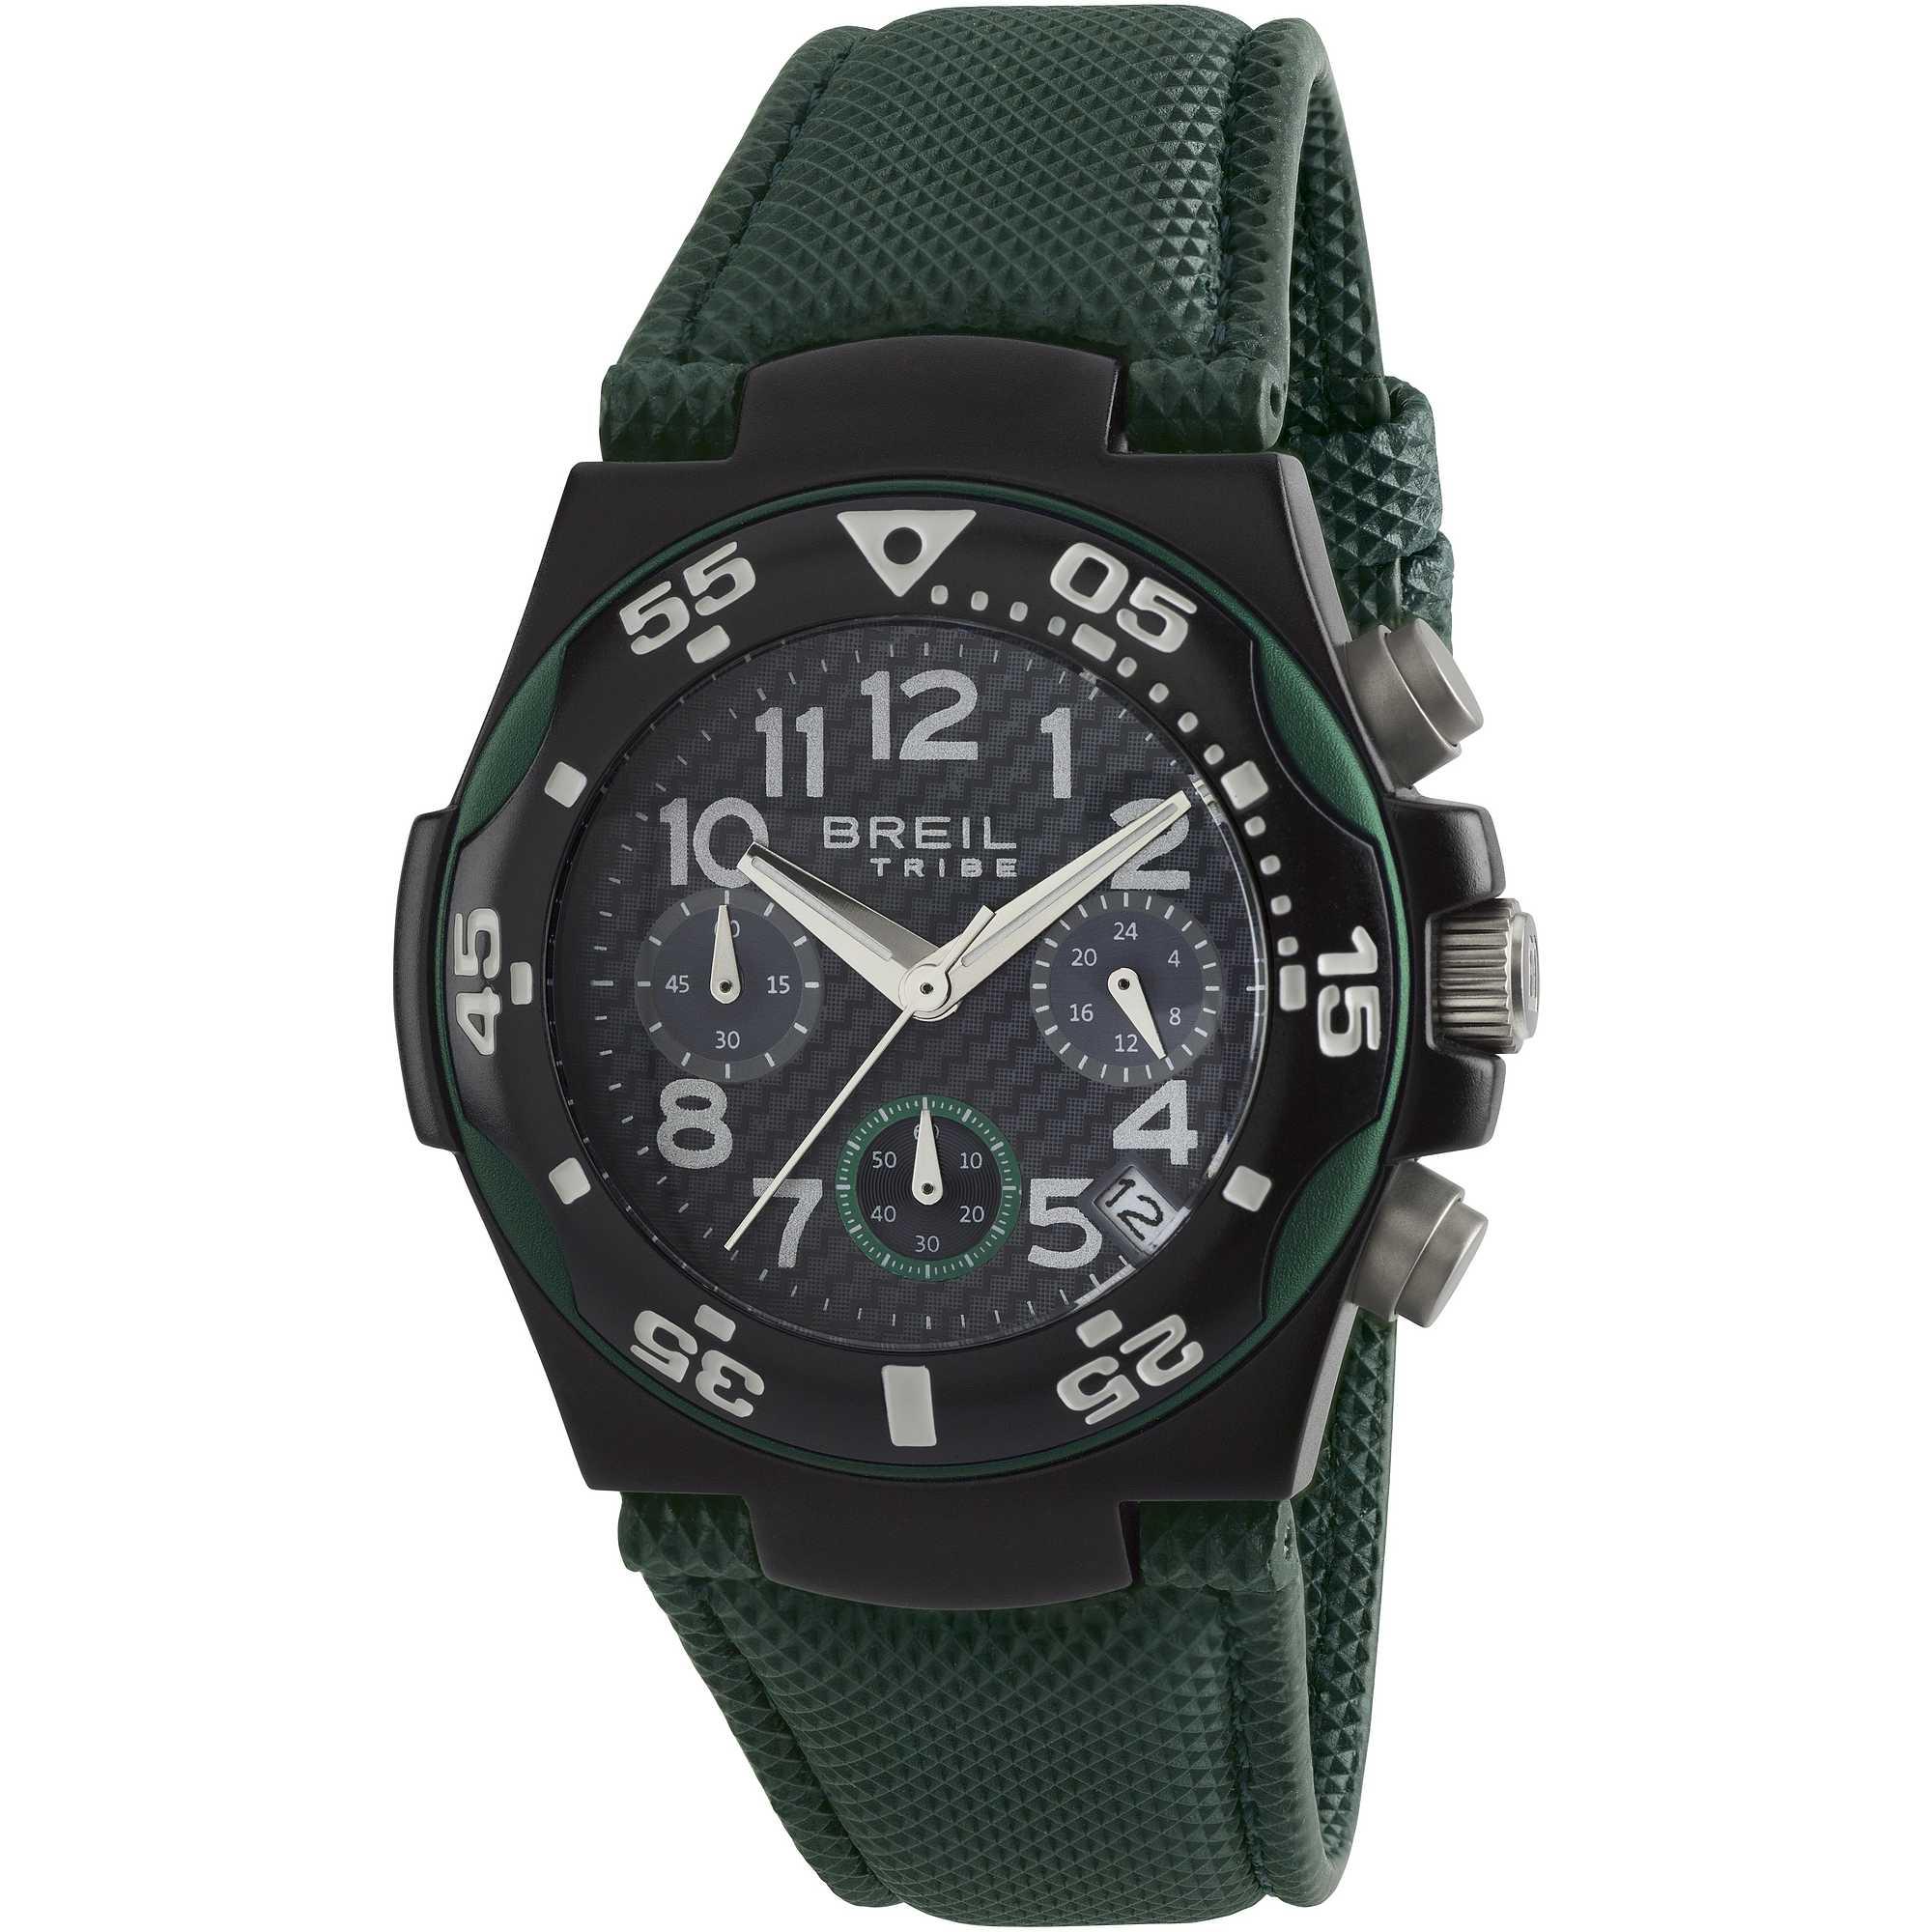 EW0286 Orologio cronografo breil uomo Ice Extension Verde - Orologi Valsusa